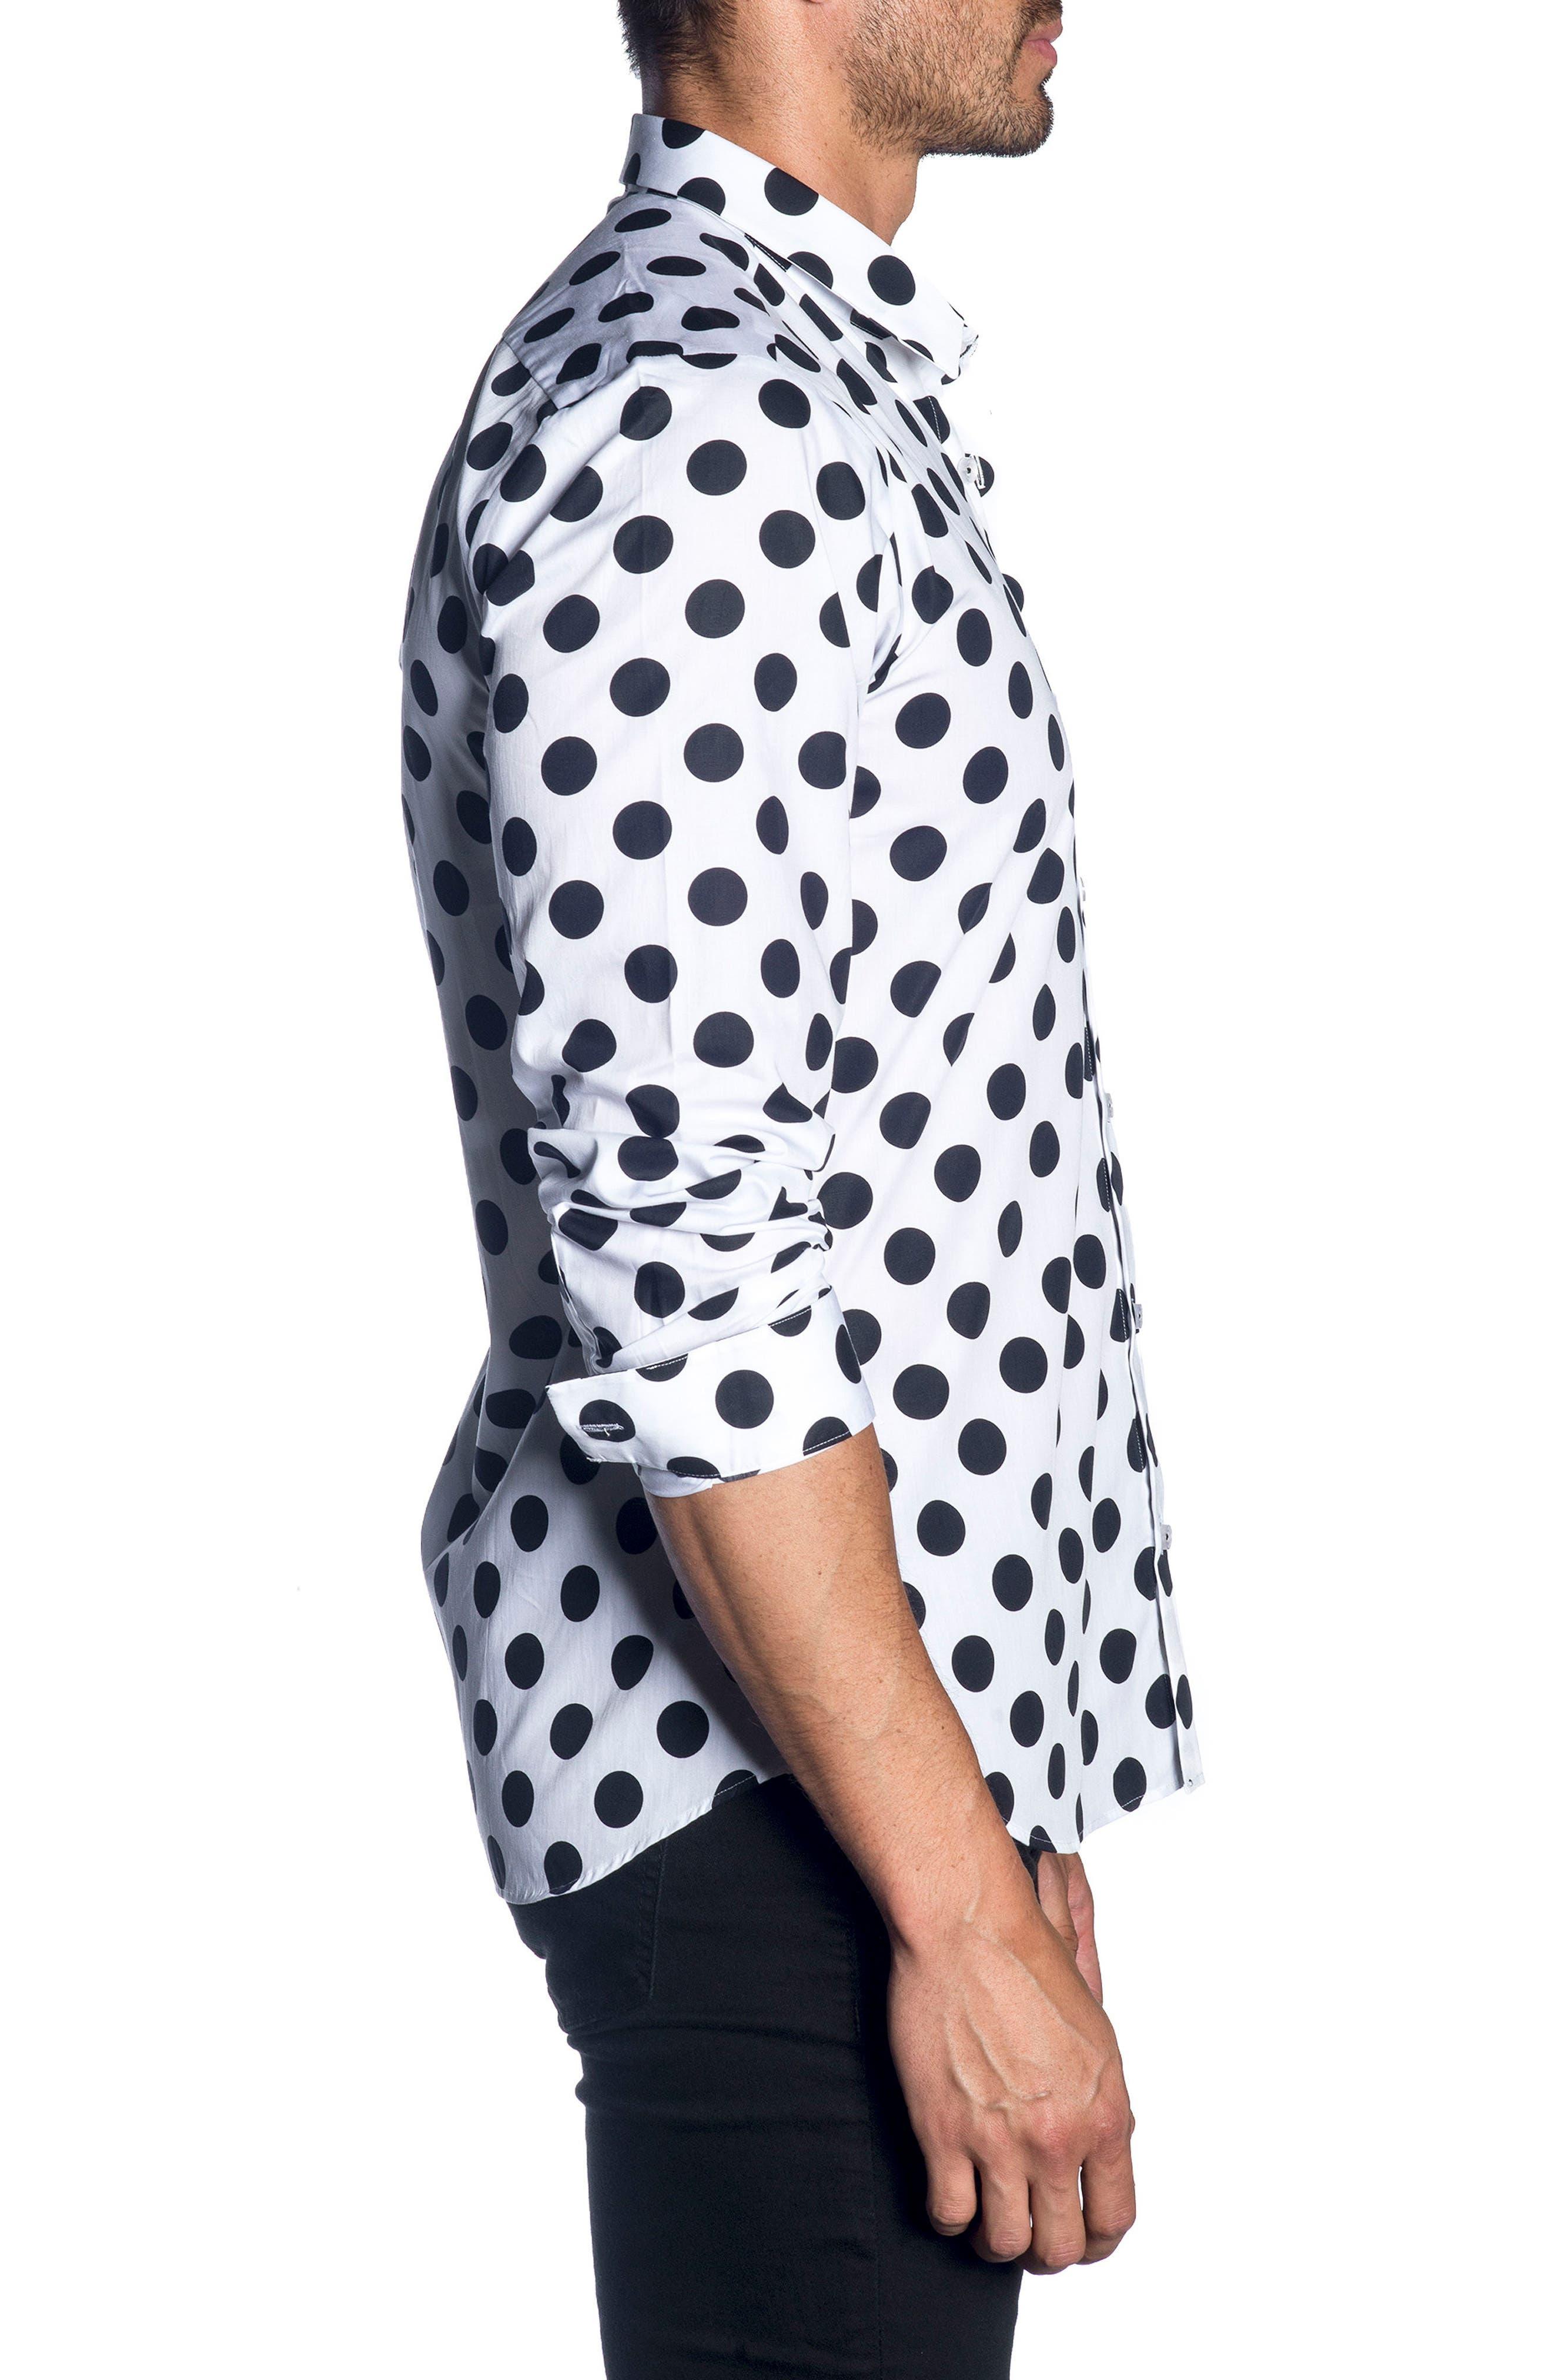 Trim Fit Sport Shirt,                             Alternate thumbnail 3, color,                             WHITE BLACK POLKA DOT